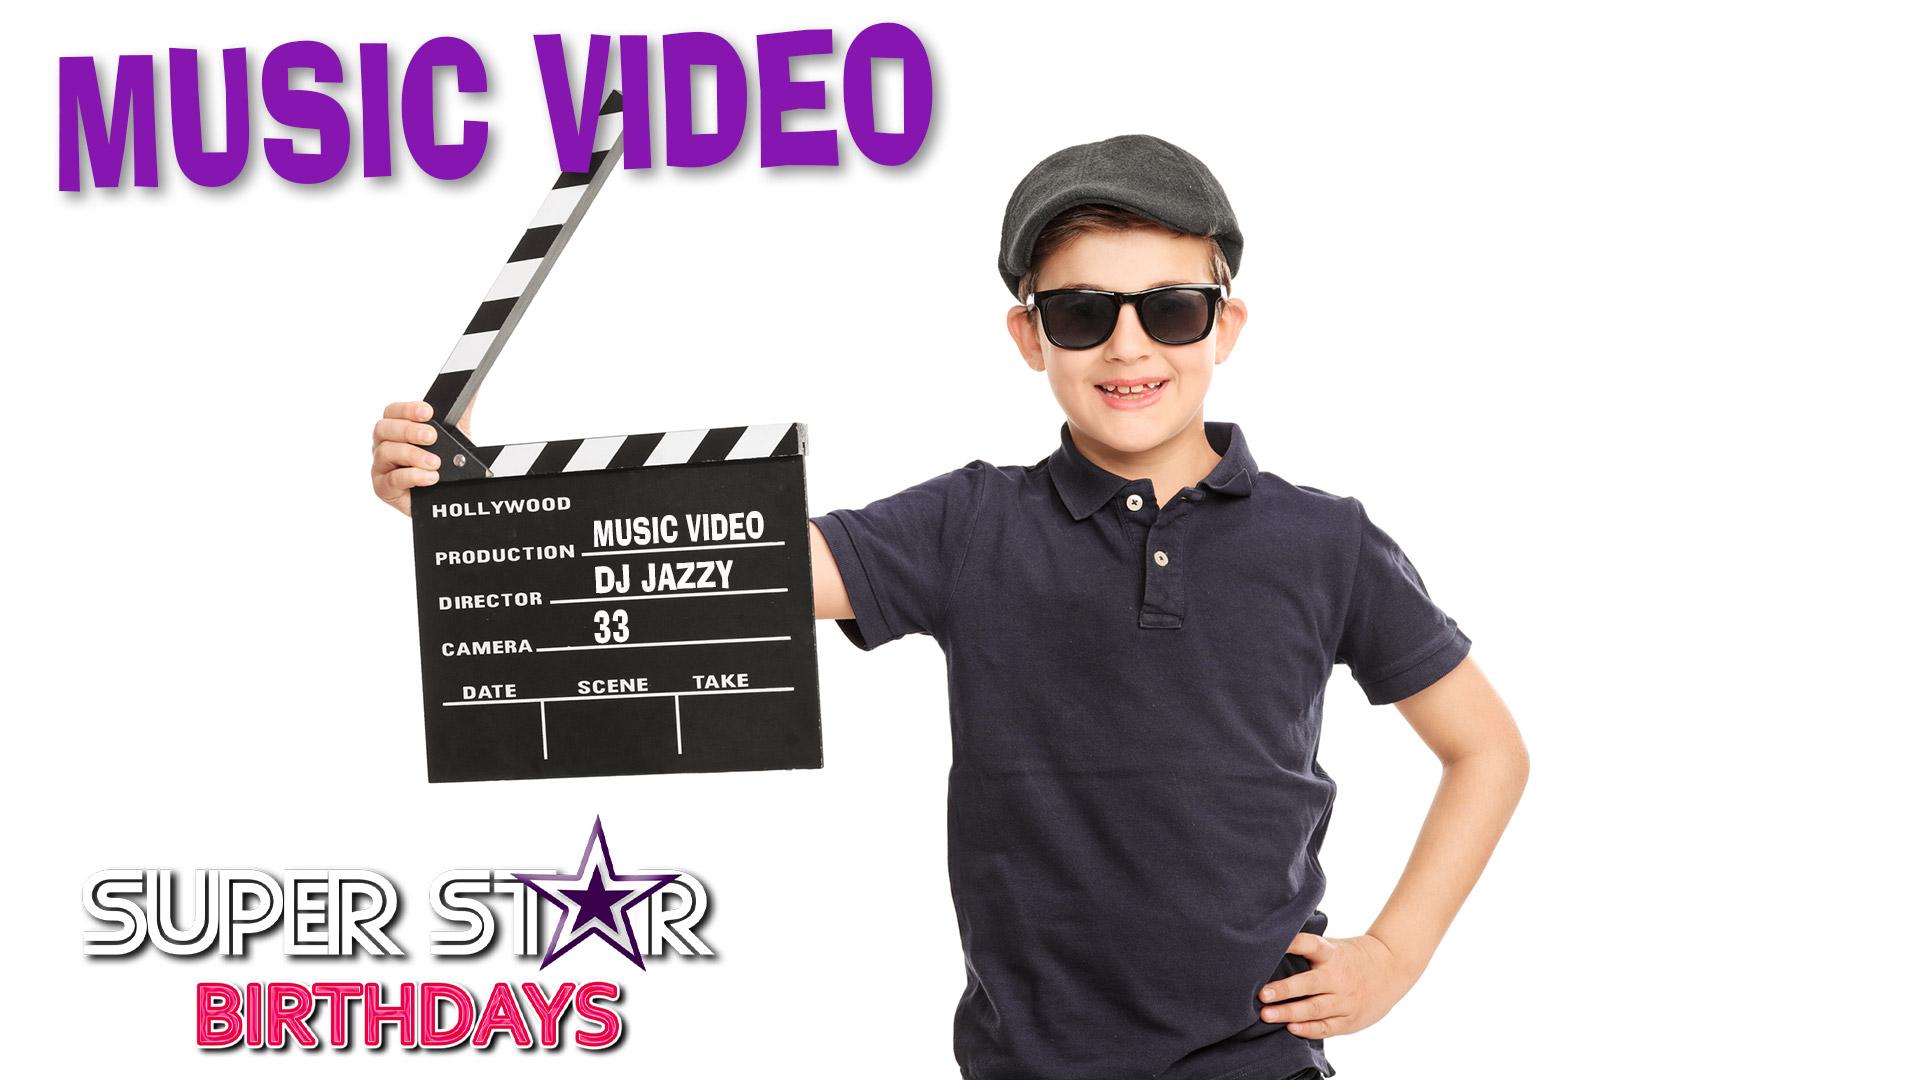 Music Video Birthday Party